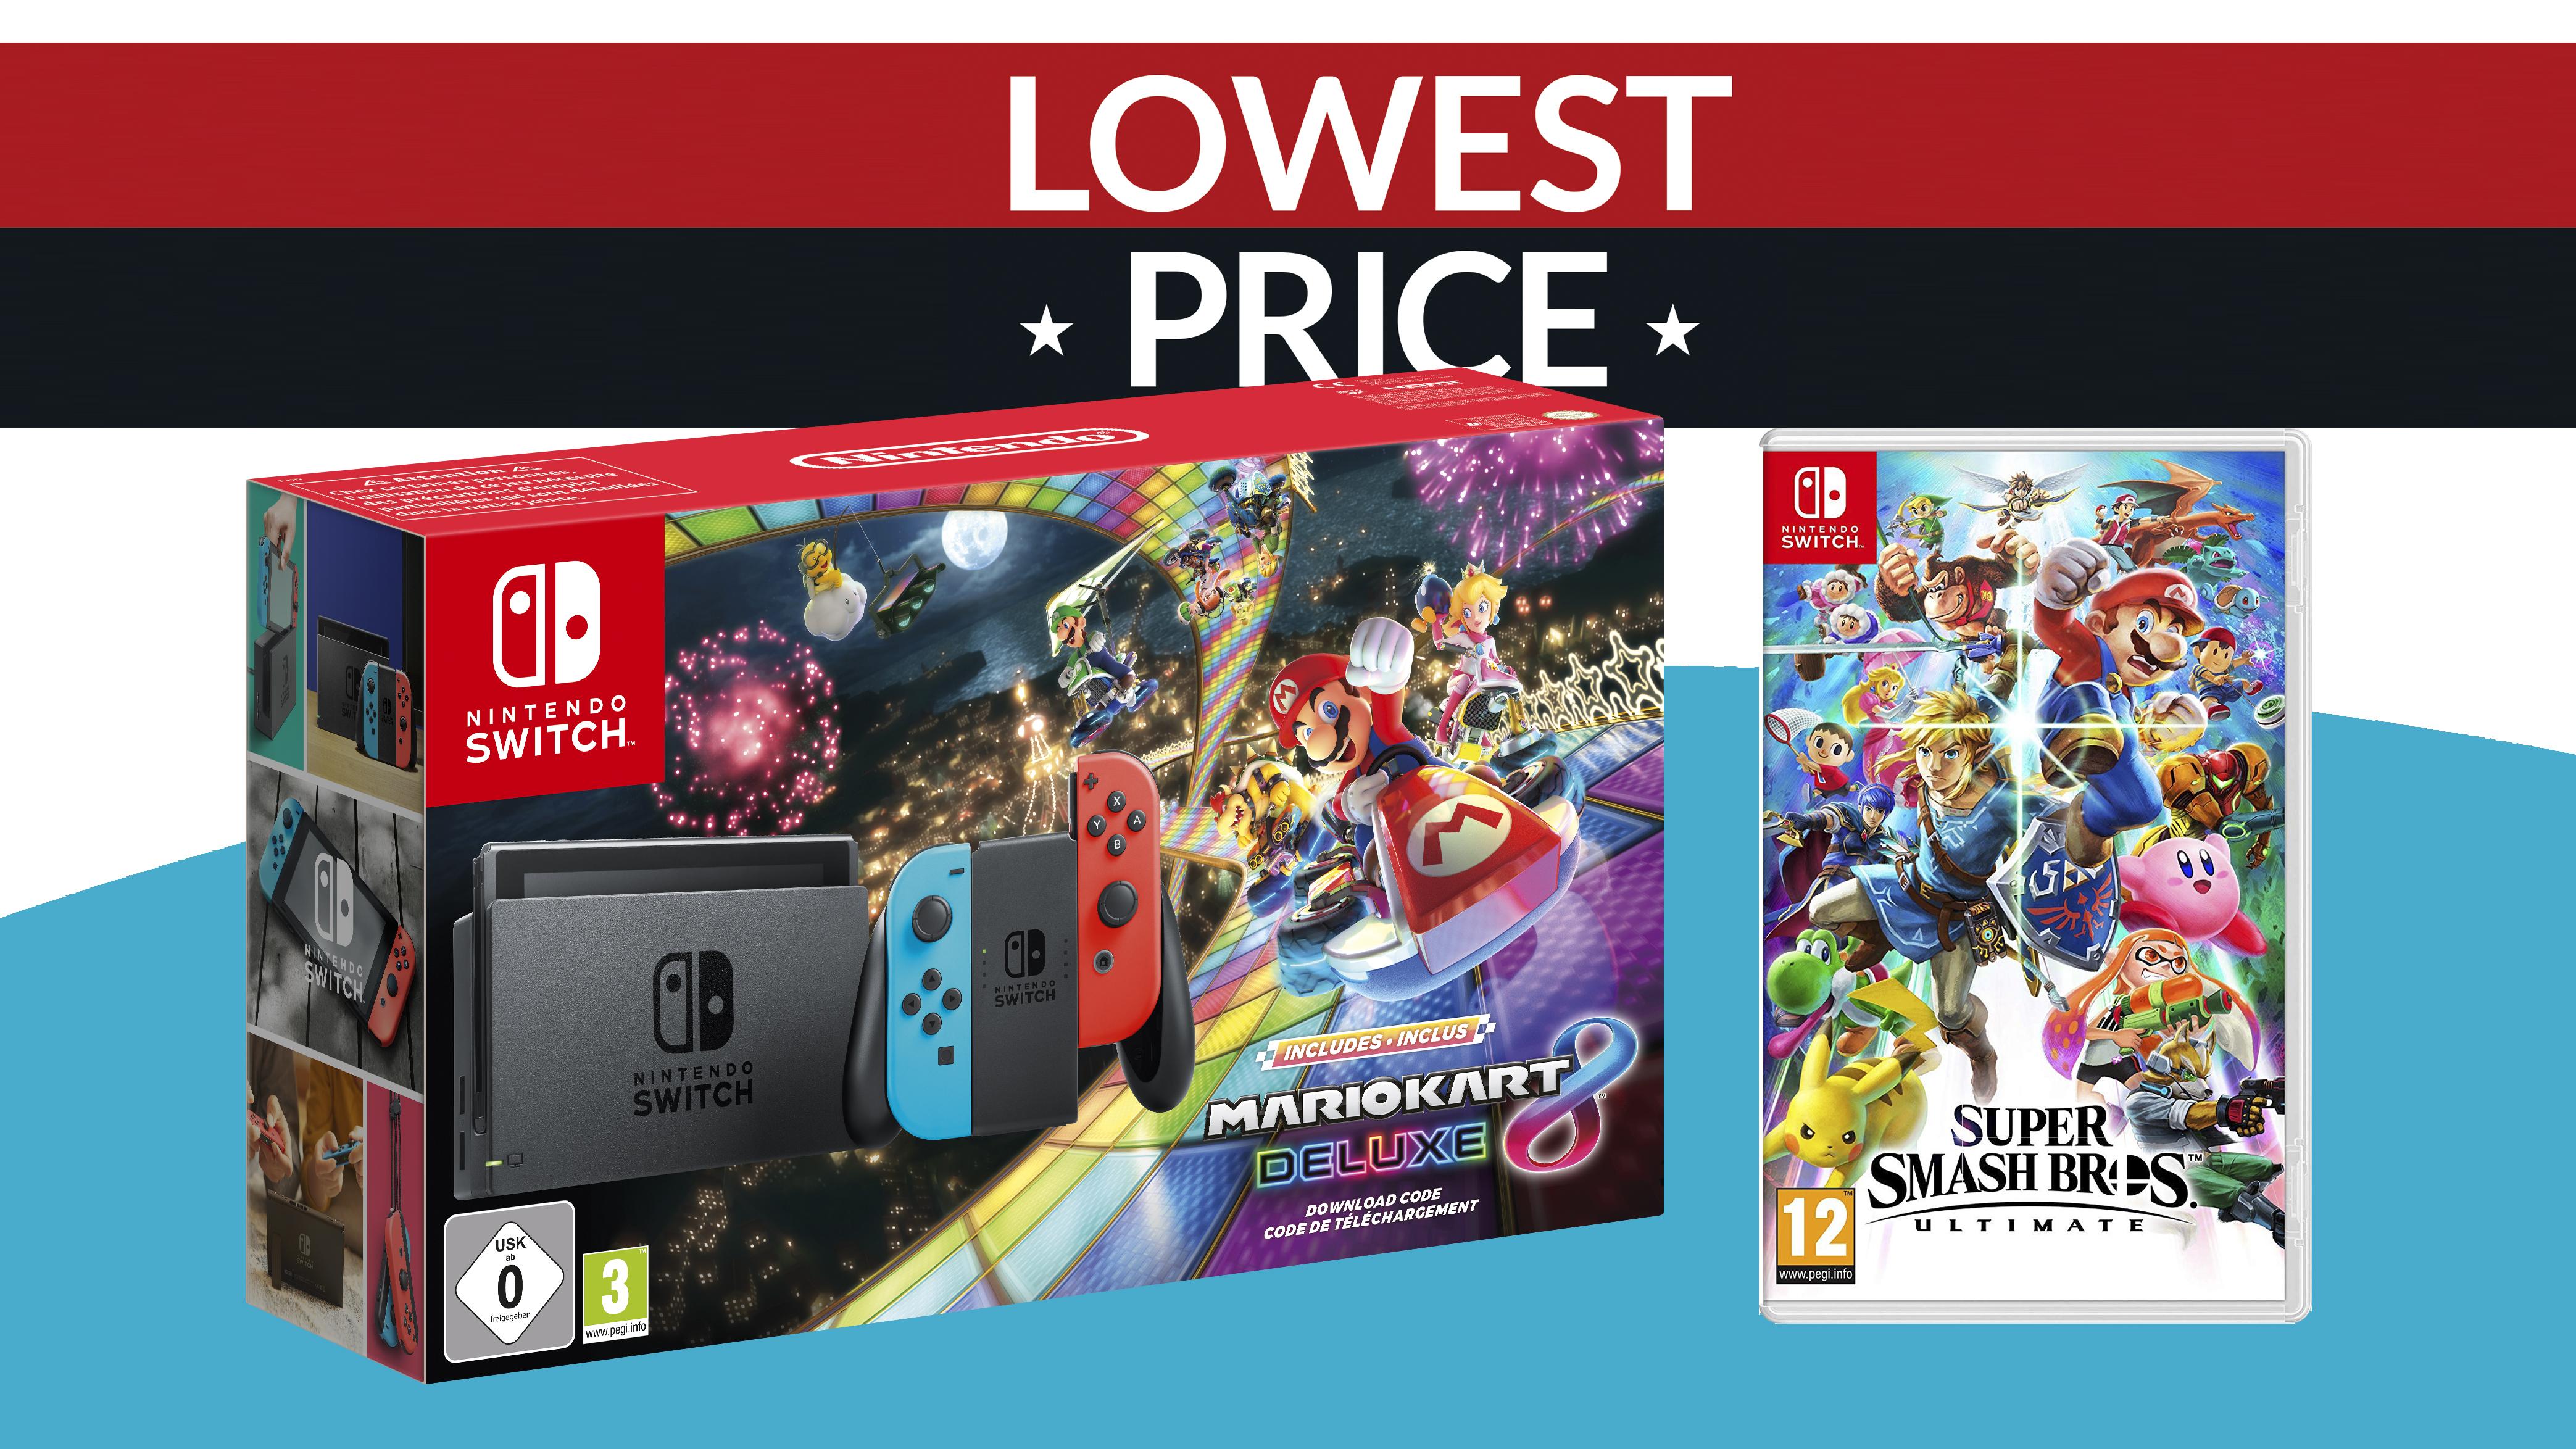 Christmas Mario Kart.Incredible Nintendo Switch Deal With Smash Bros Ultimate And